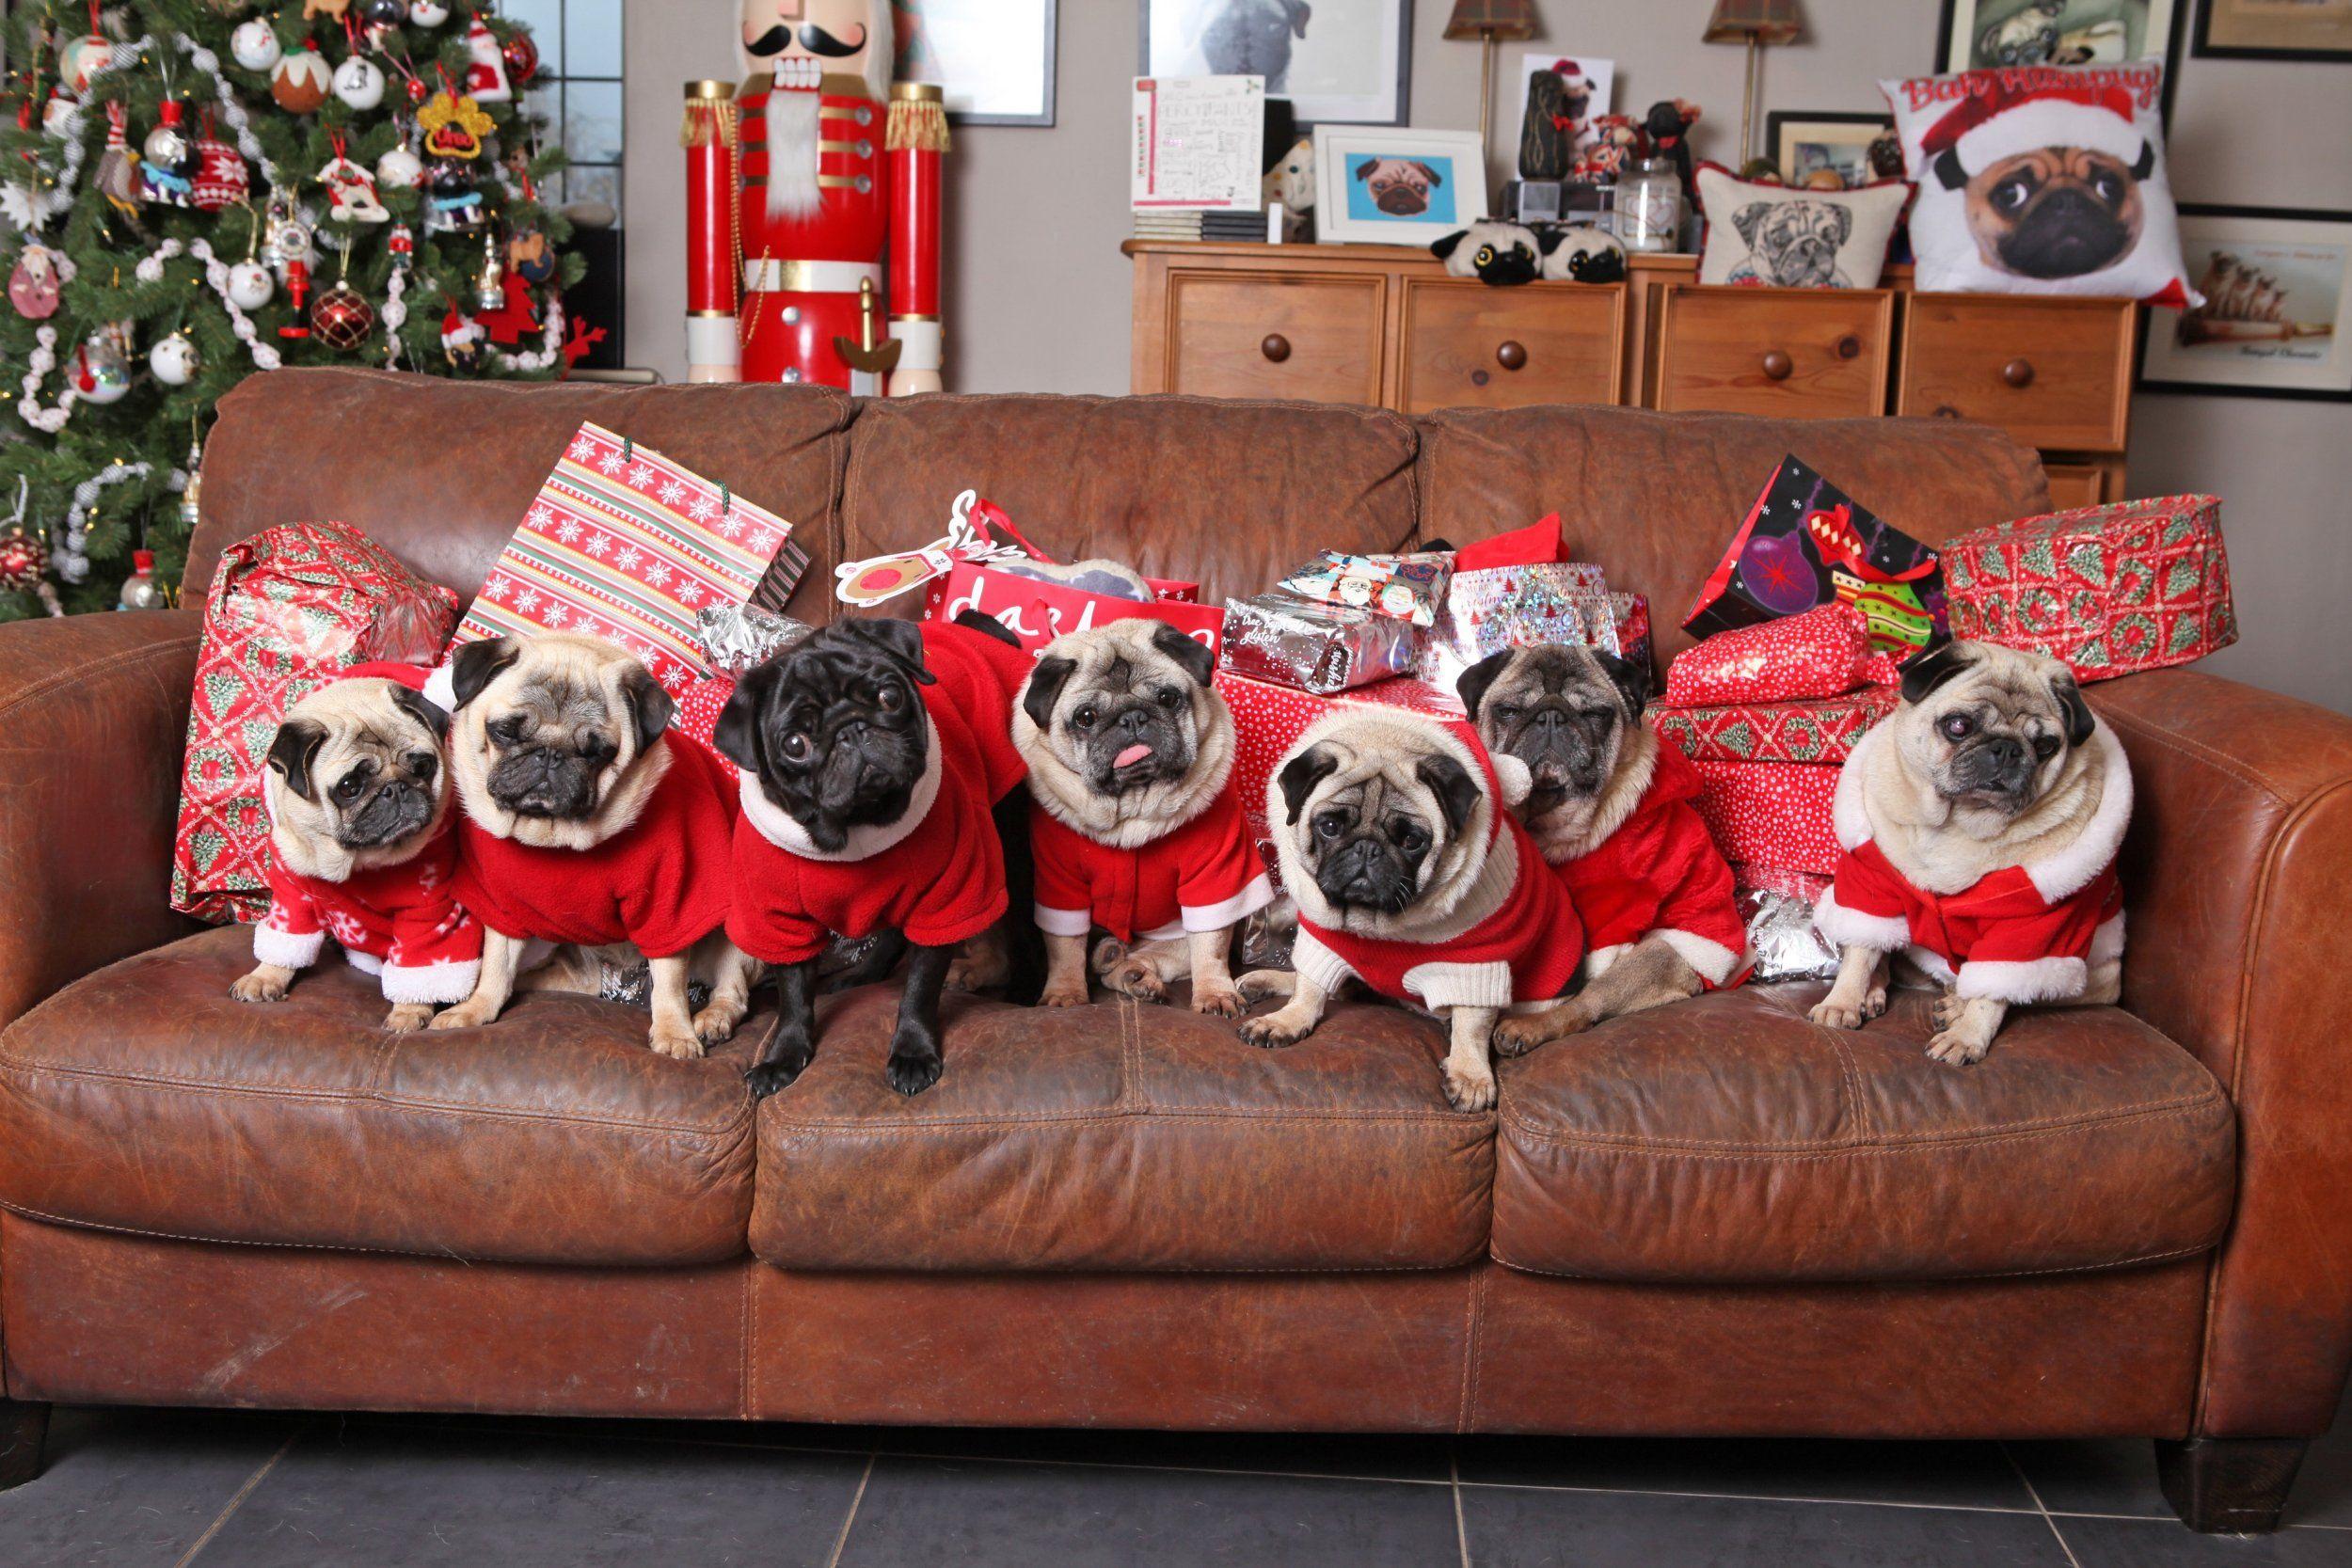 Pugs on Christmas